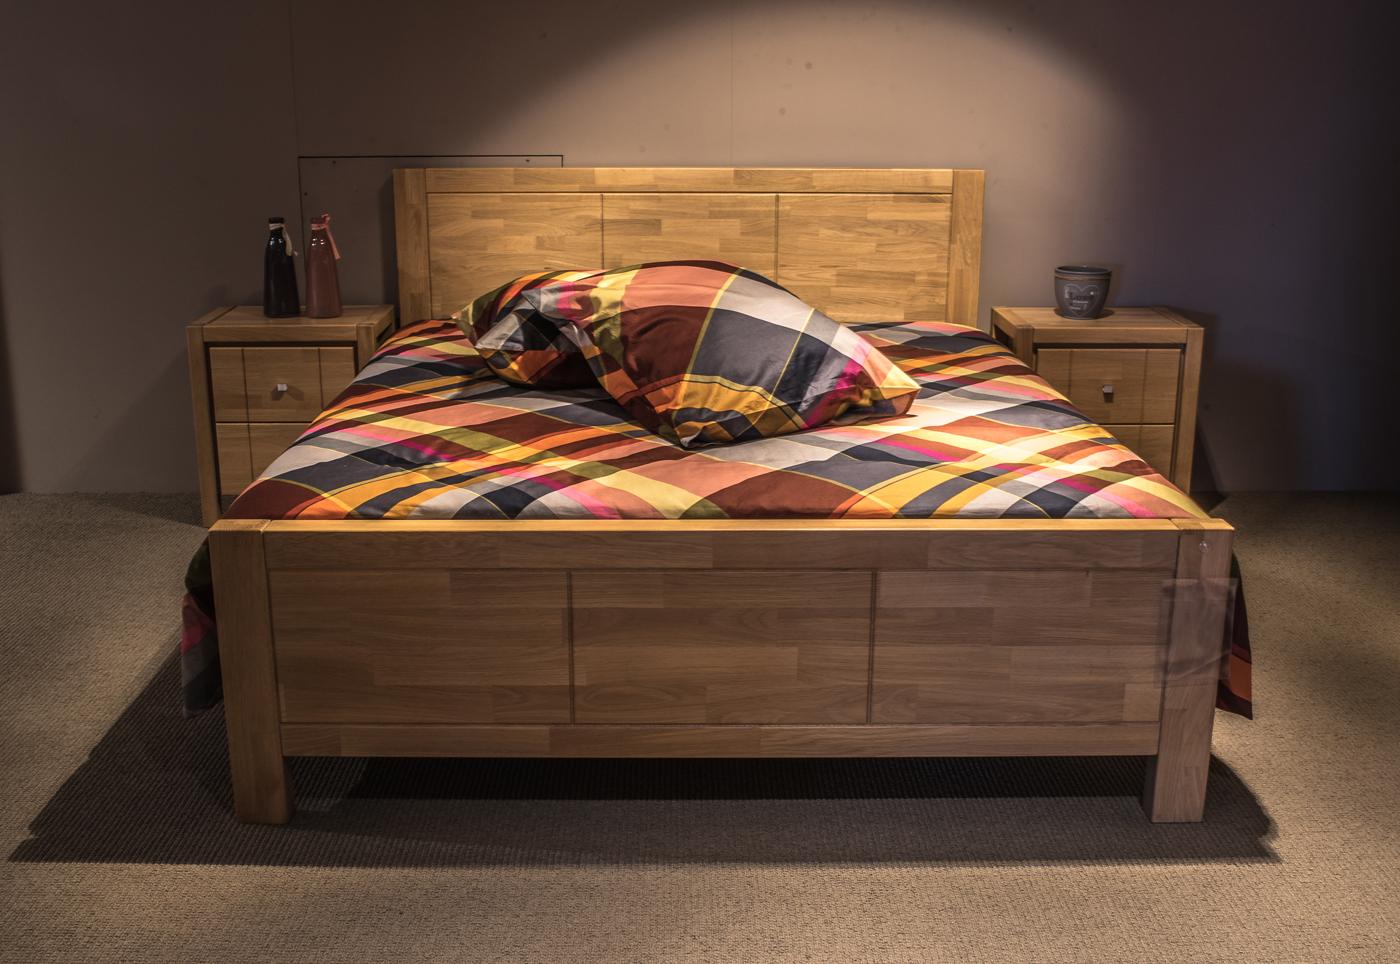 slaapkamer kleuren slapen ~ lactate for ., Deco ideeën